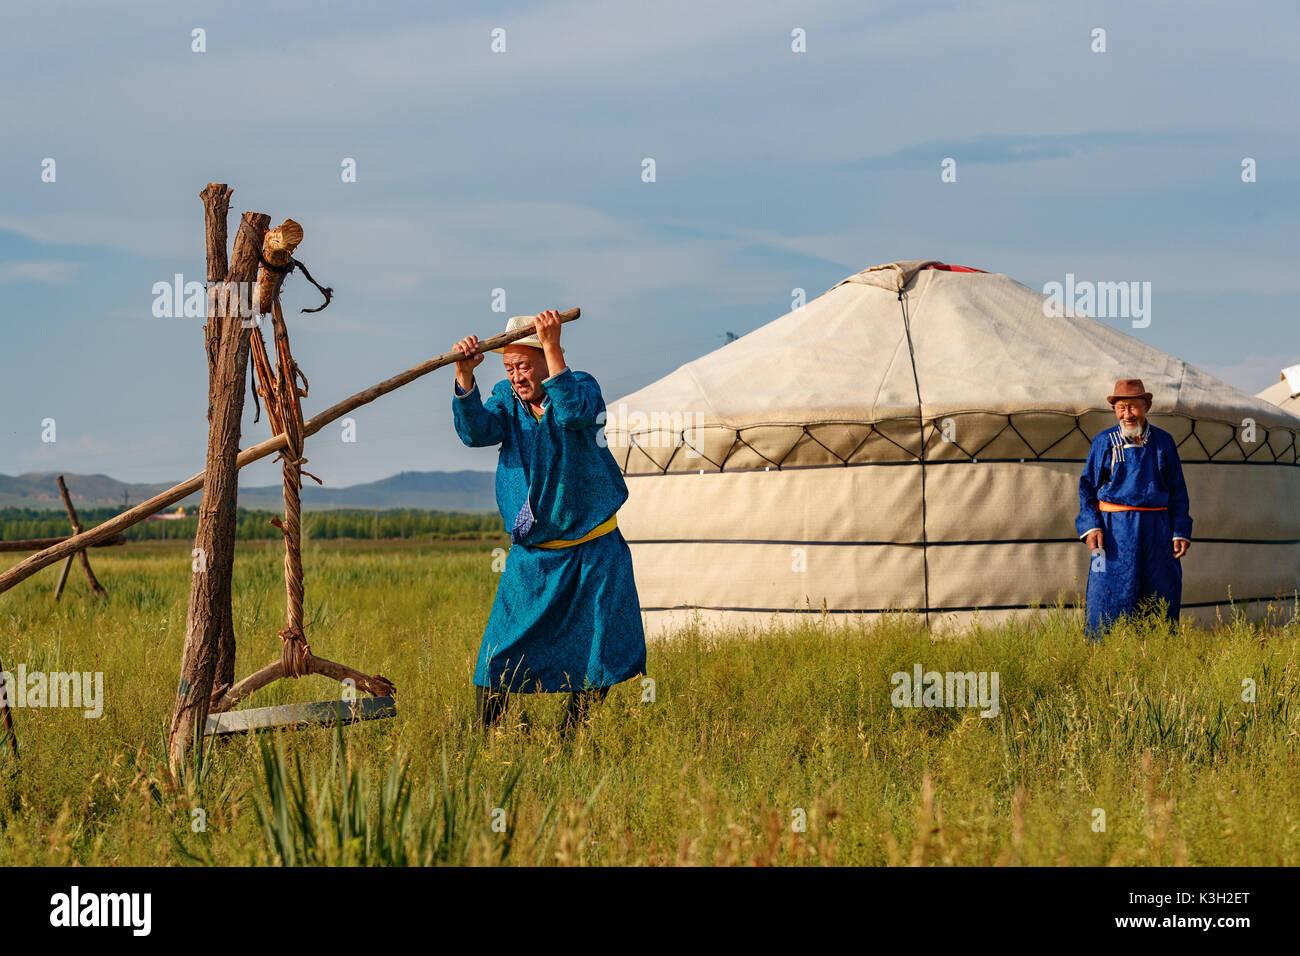 Mongolia interior, China-July 26, 2017: tradicionalmente vestidos viejos hombres mongol procesar las pieles de oveja Foto de stock